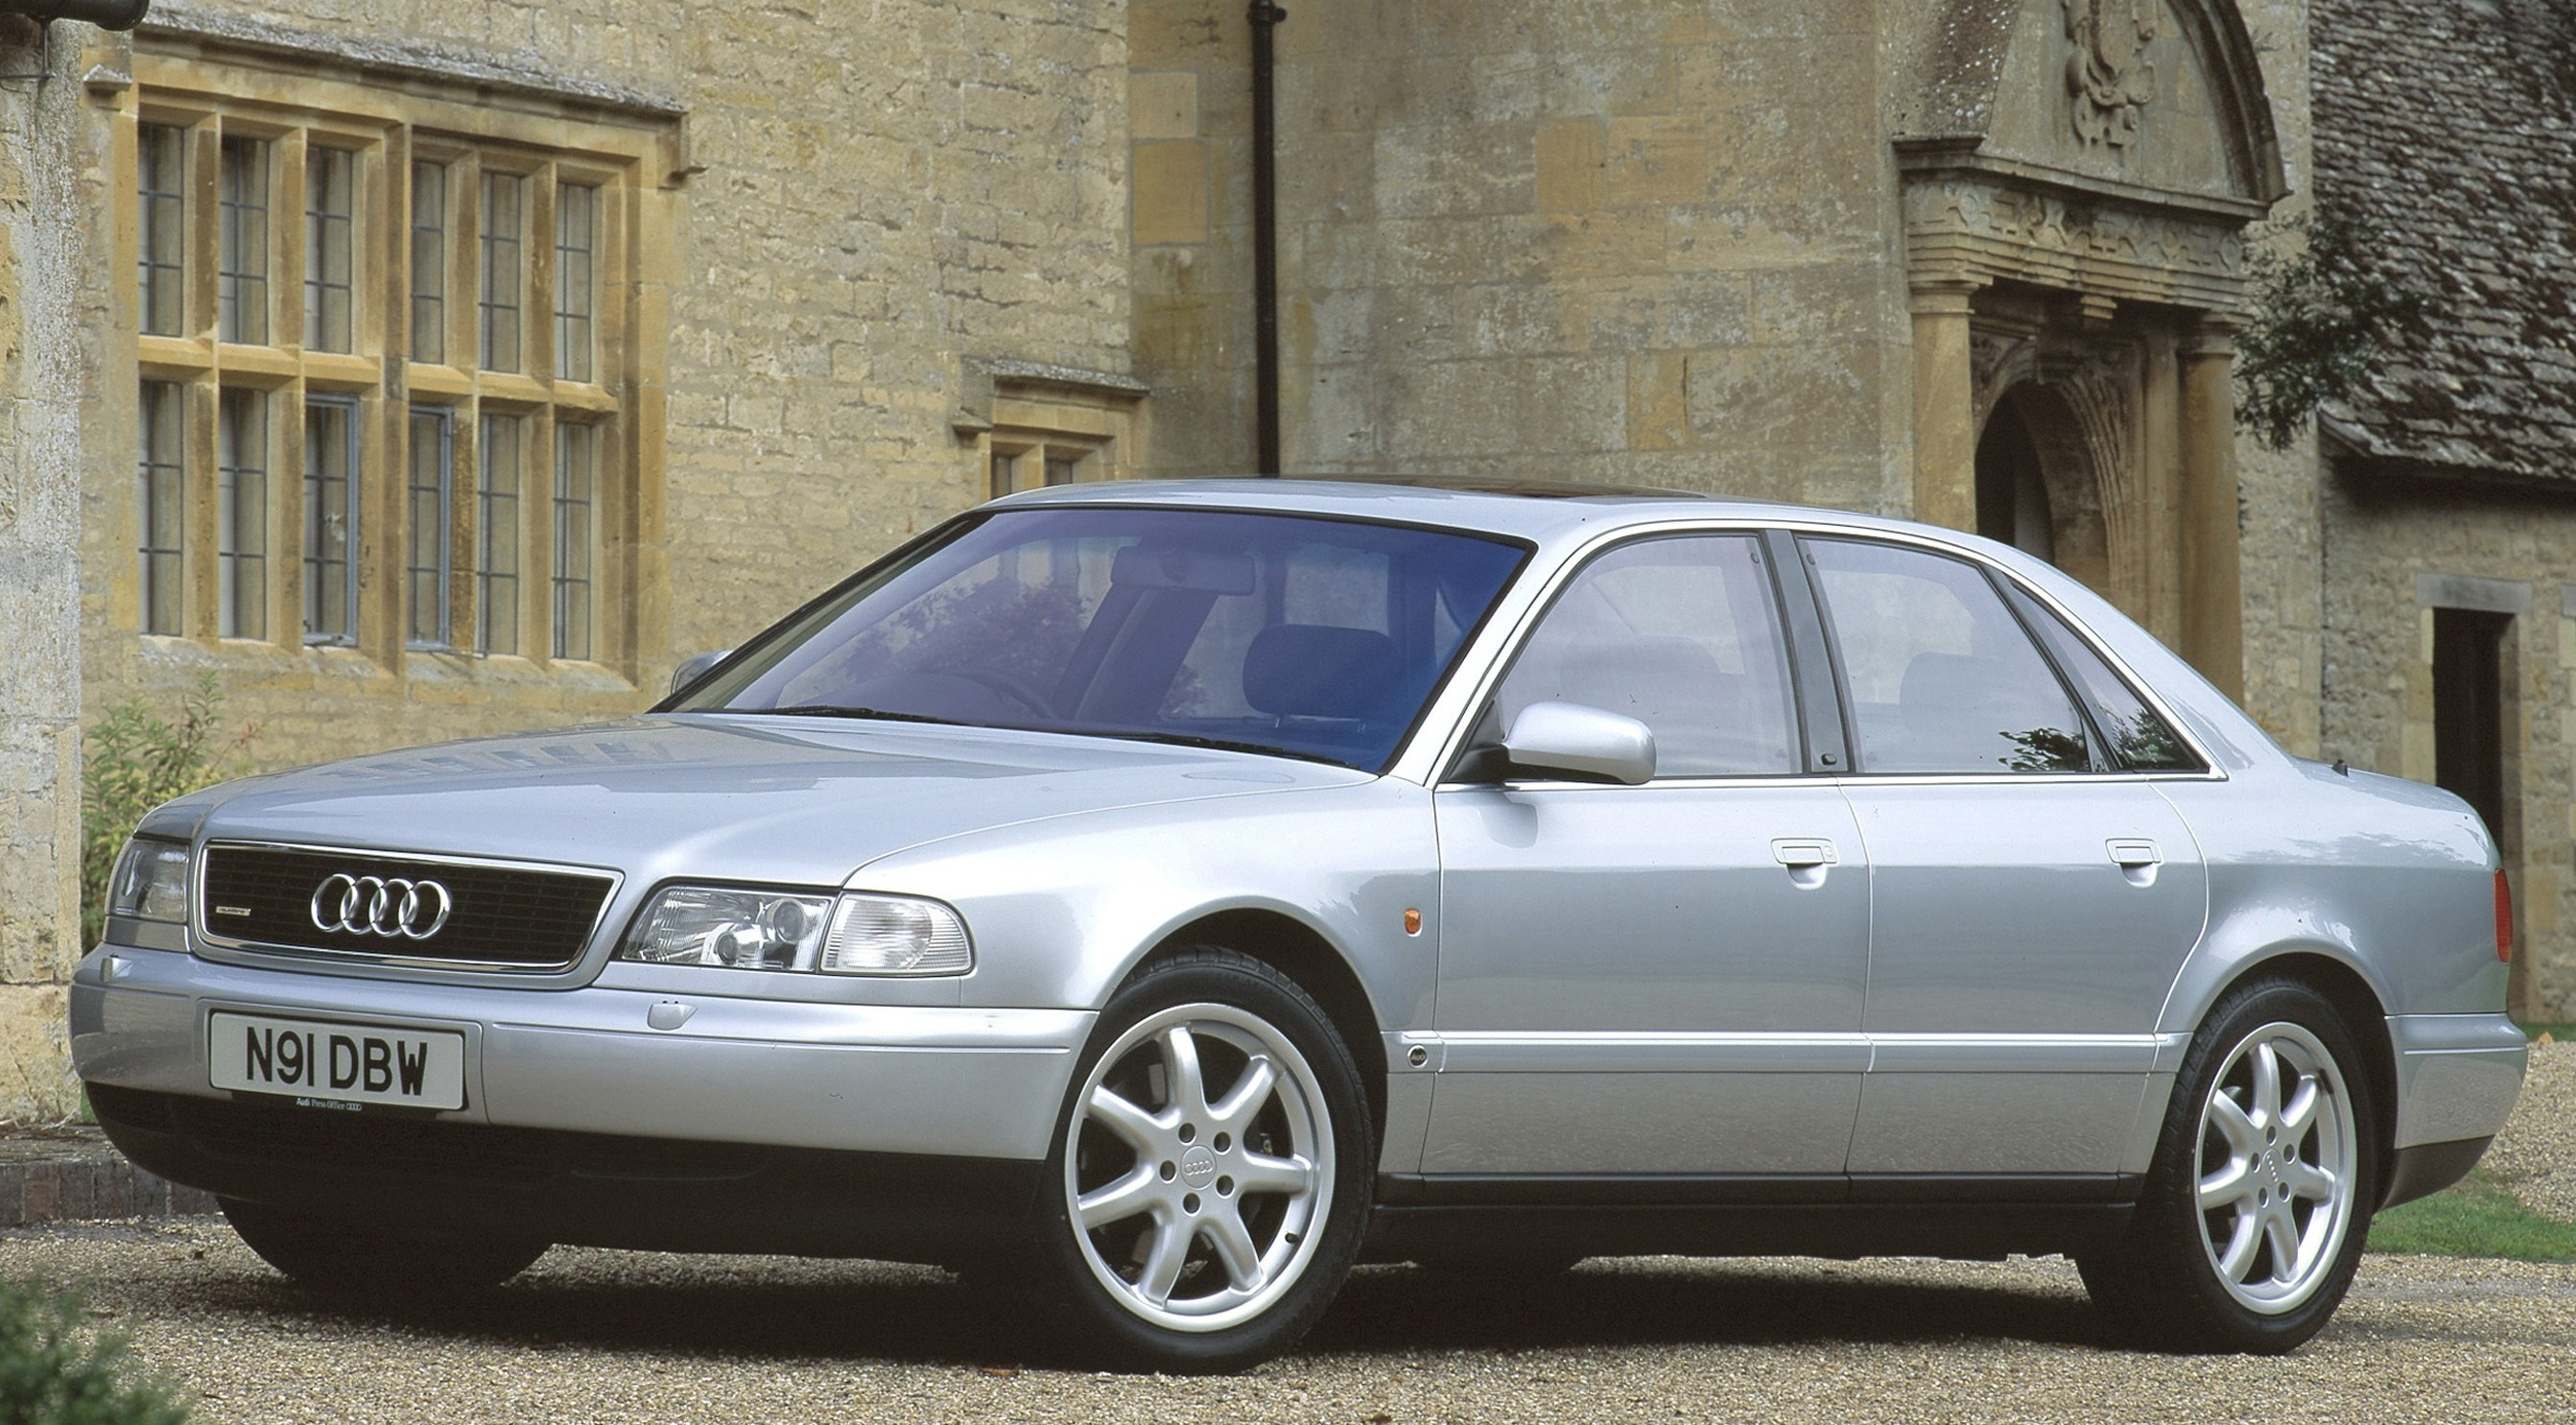 First generation Audi A8